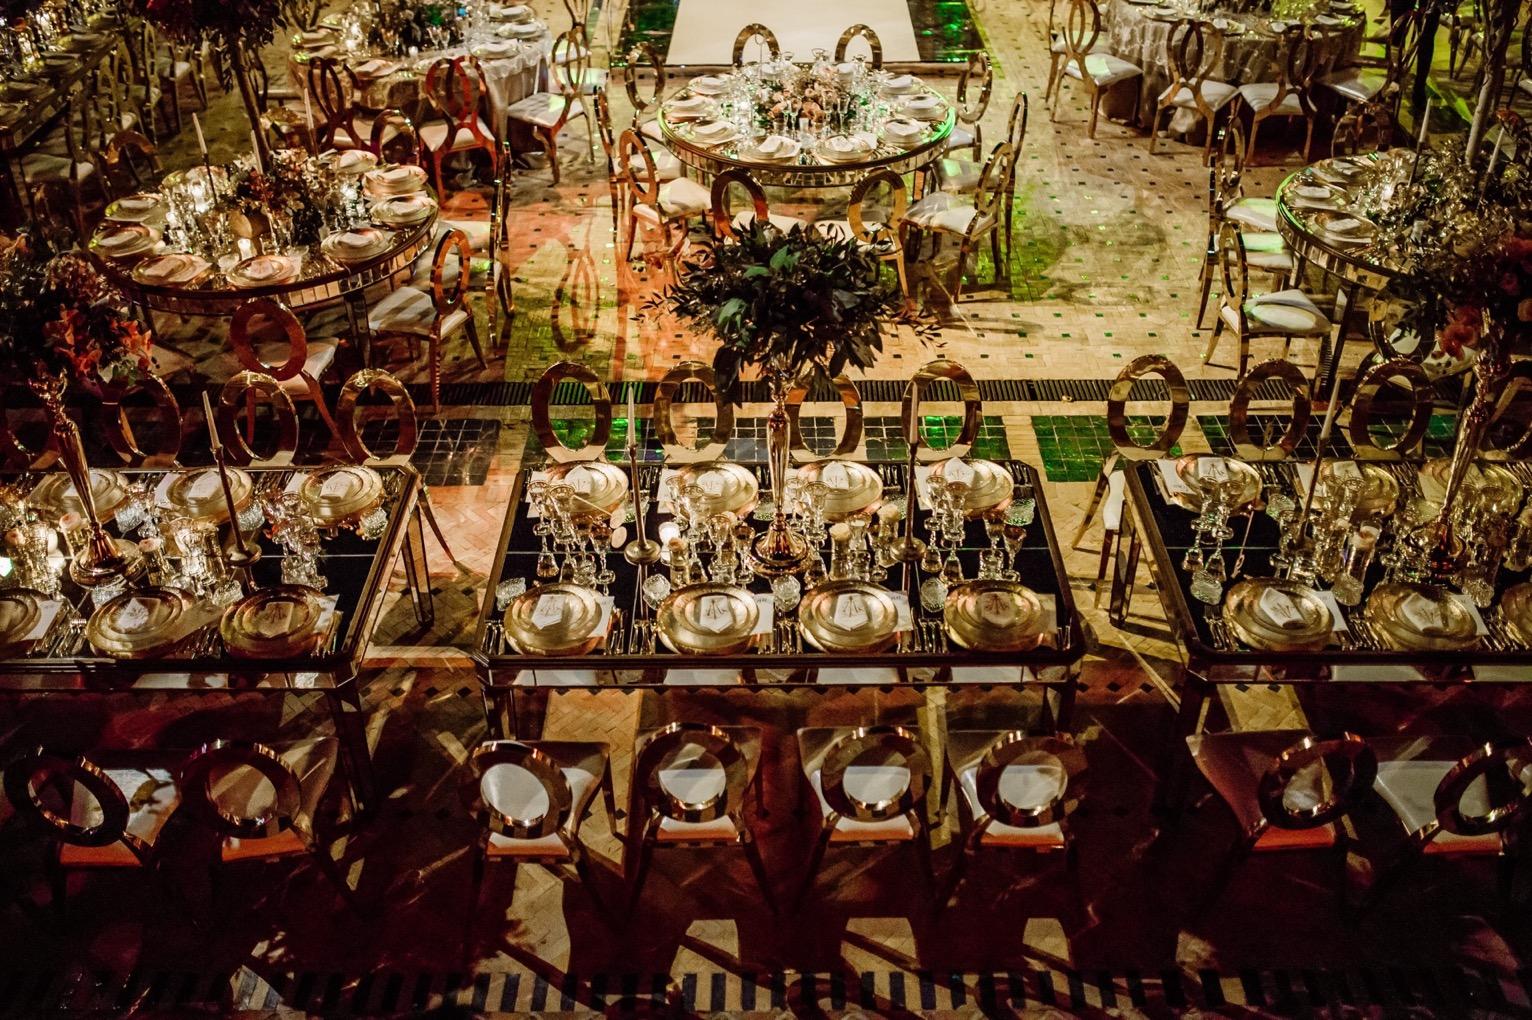 Si-Quiero-Wedding-Planner-By-Sira-Antequera-Bodas-Málaga-Marbella-Miami- L-A-21